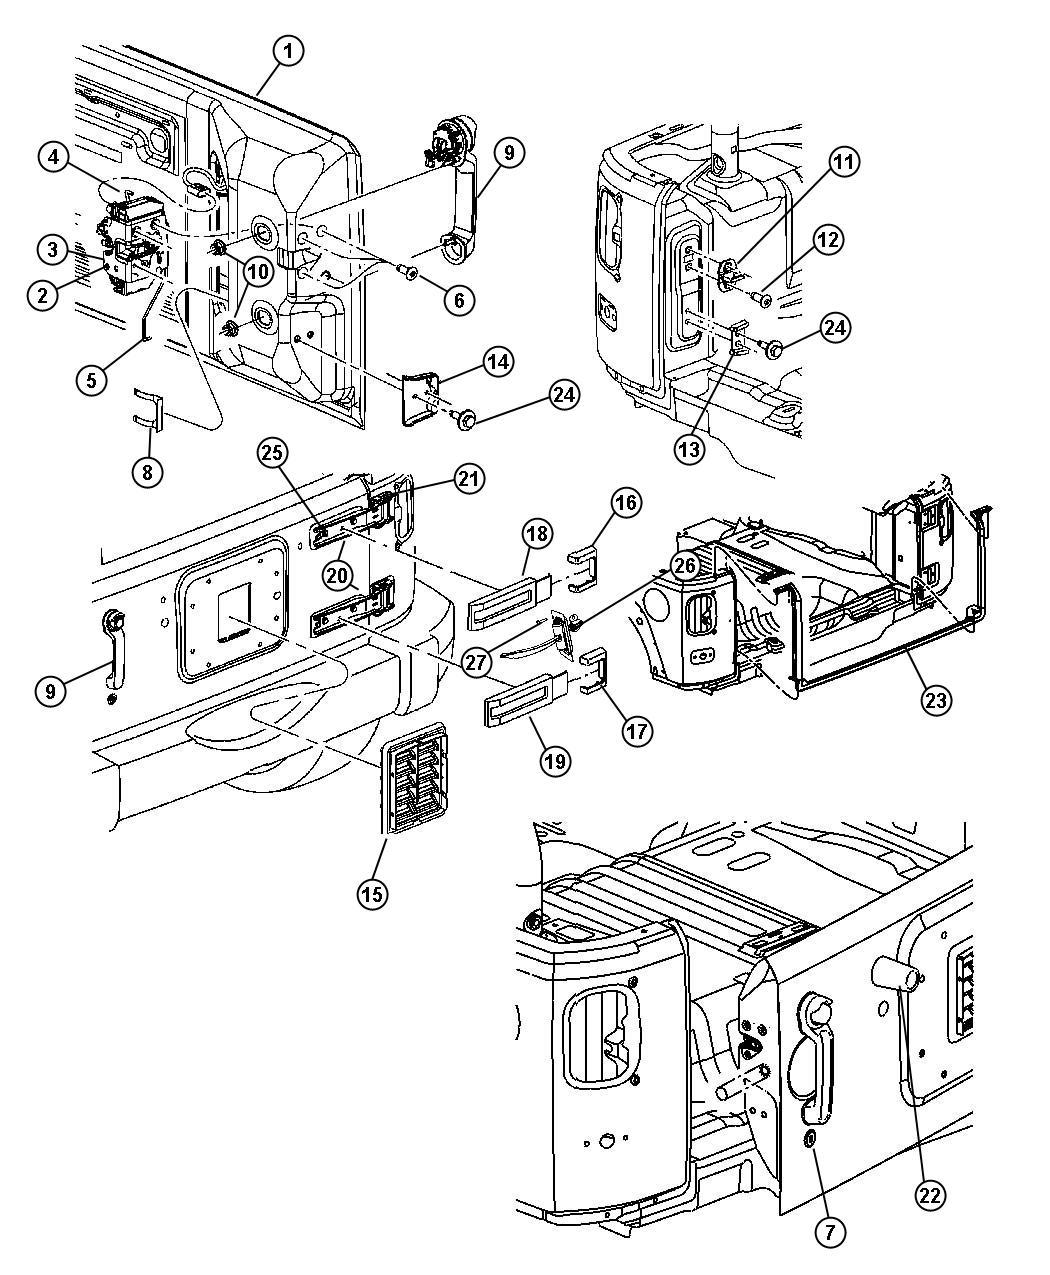 Jeep Parts Jeep Accessories Jeep Soft Tops At Morris 4x4